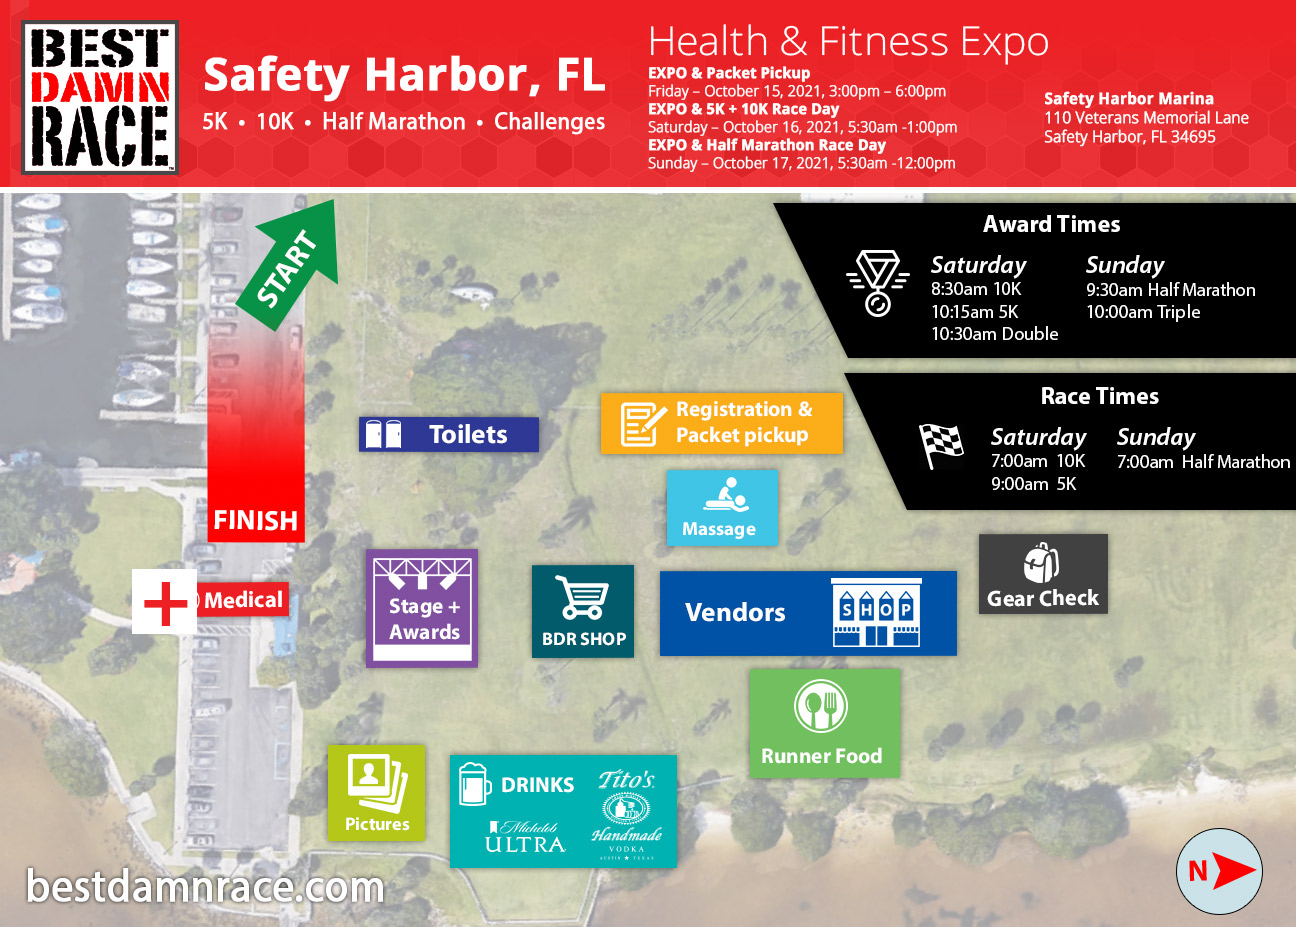 2021 Expo & Venue - Safety Harbor, FL Best Damn Race